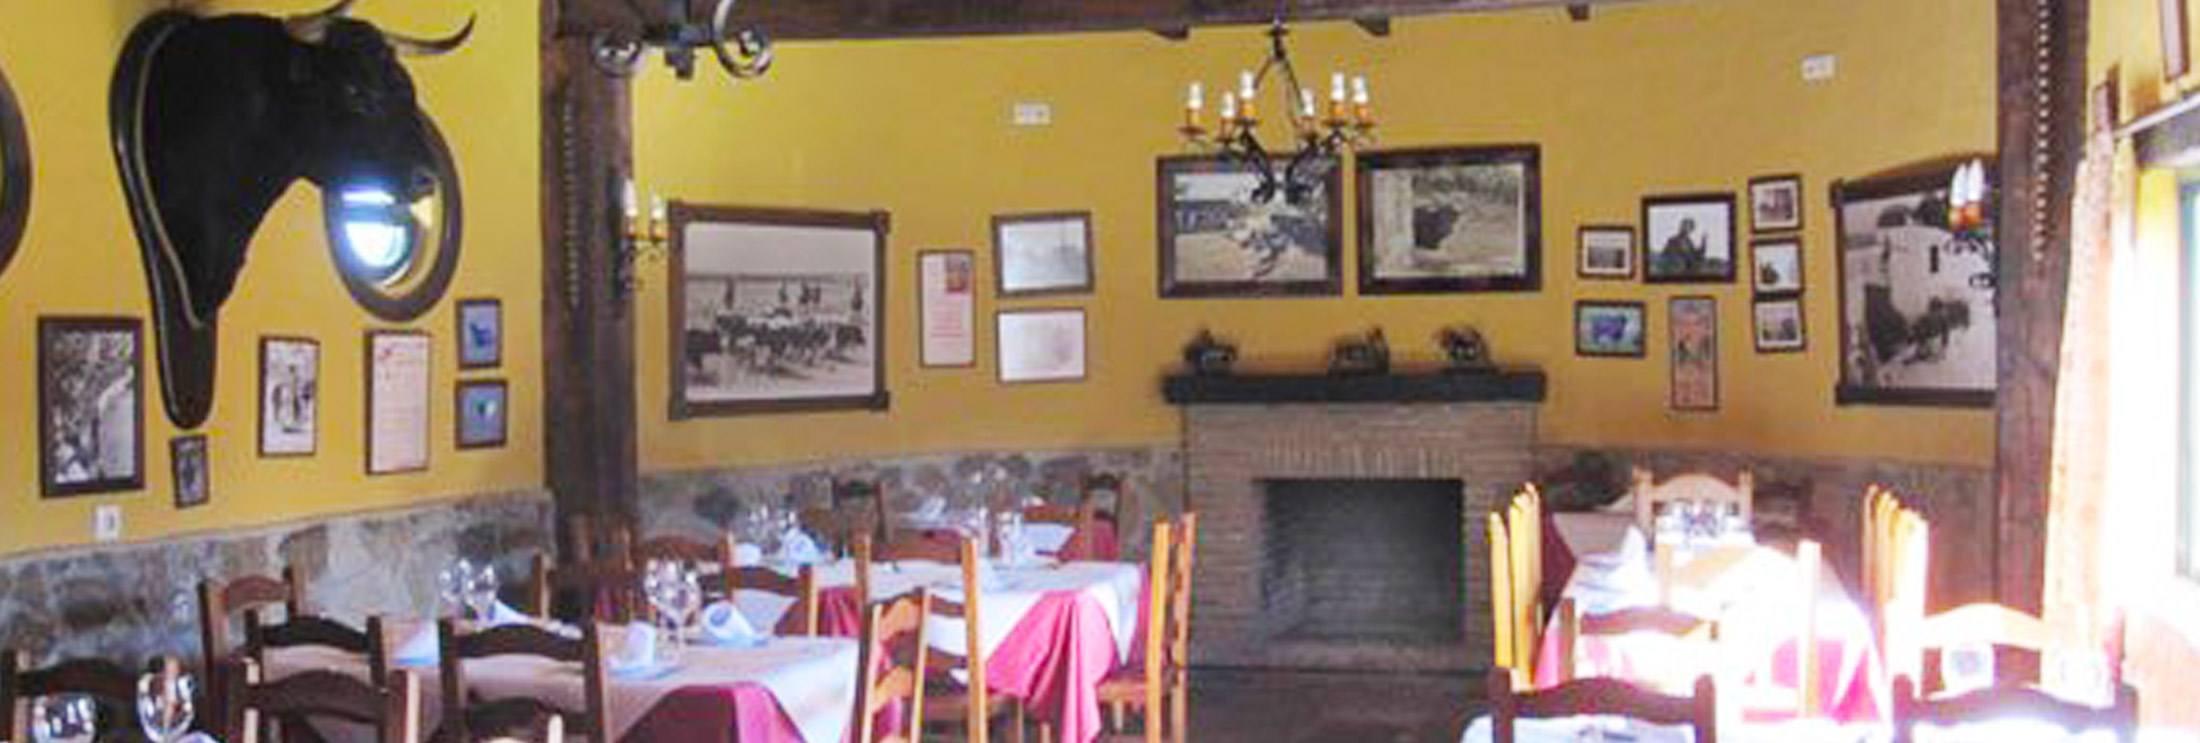 Ventorillo-El-Nene-Restaurant-Steak House-Spanish food-Facinas-Tarifa